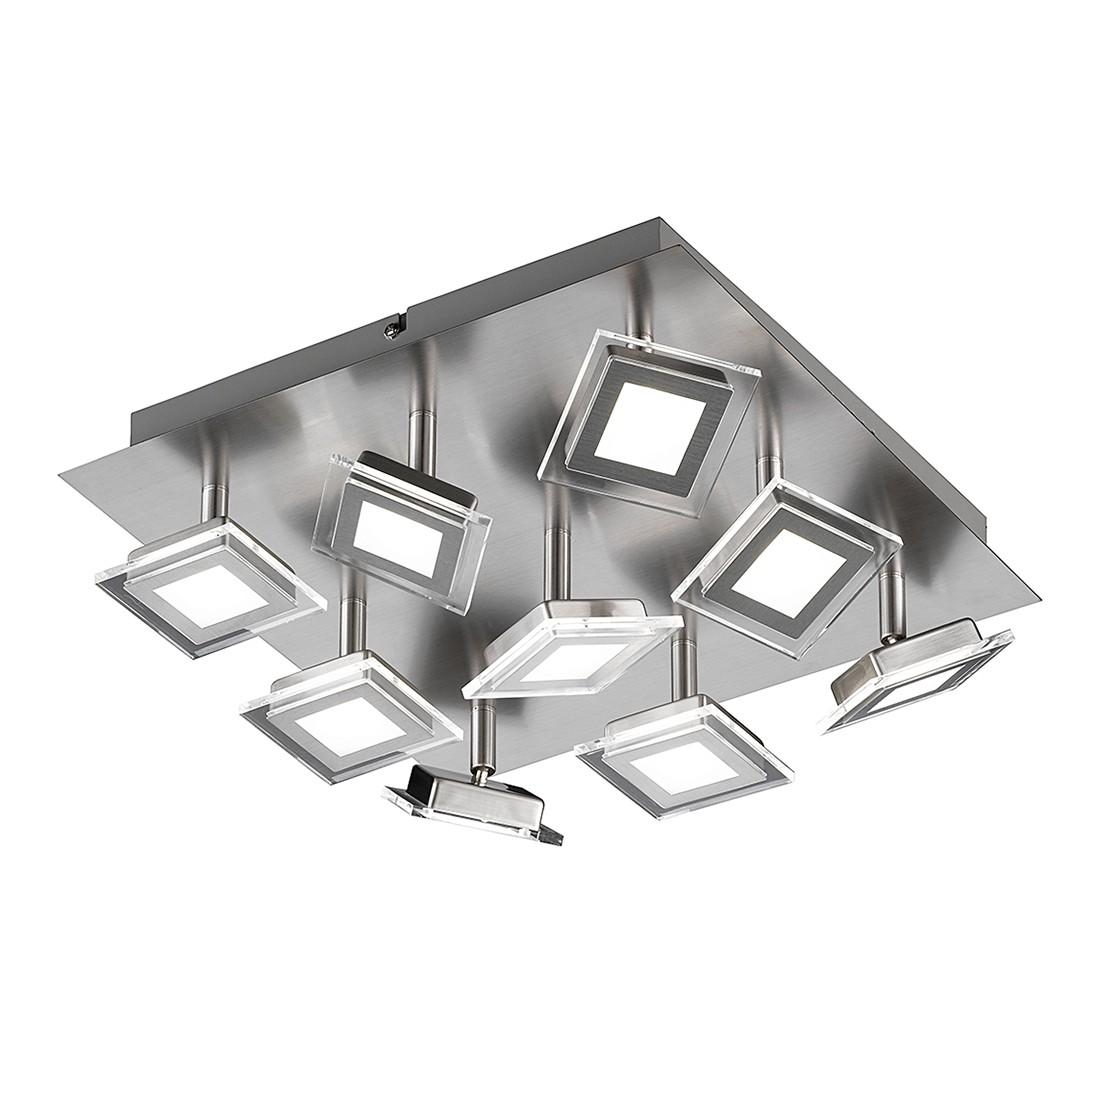 energie  A+, Plafondlamp CHOLET - metaal/kunststof 9 lichtbronnen, Wofi